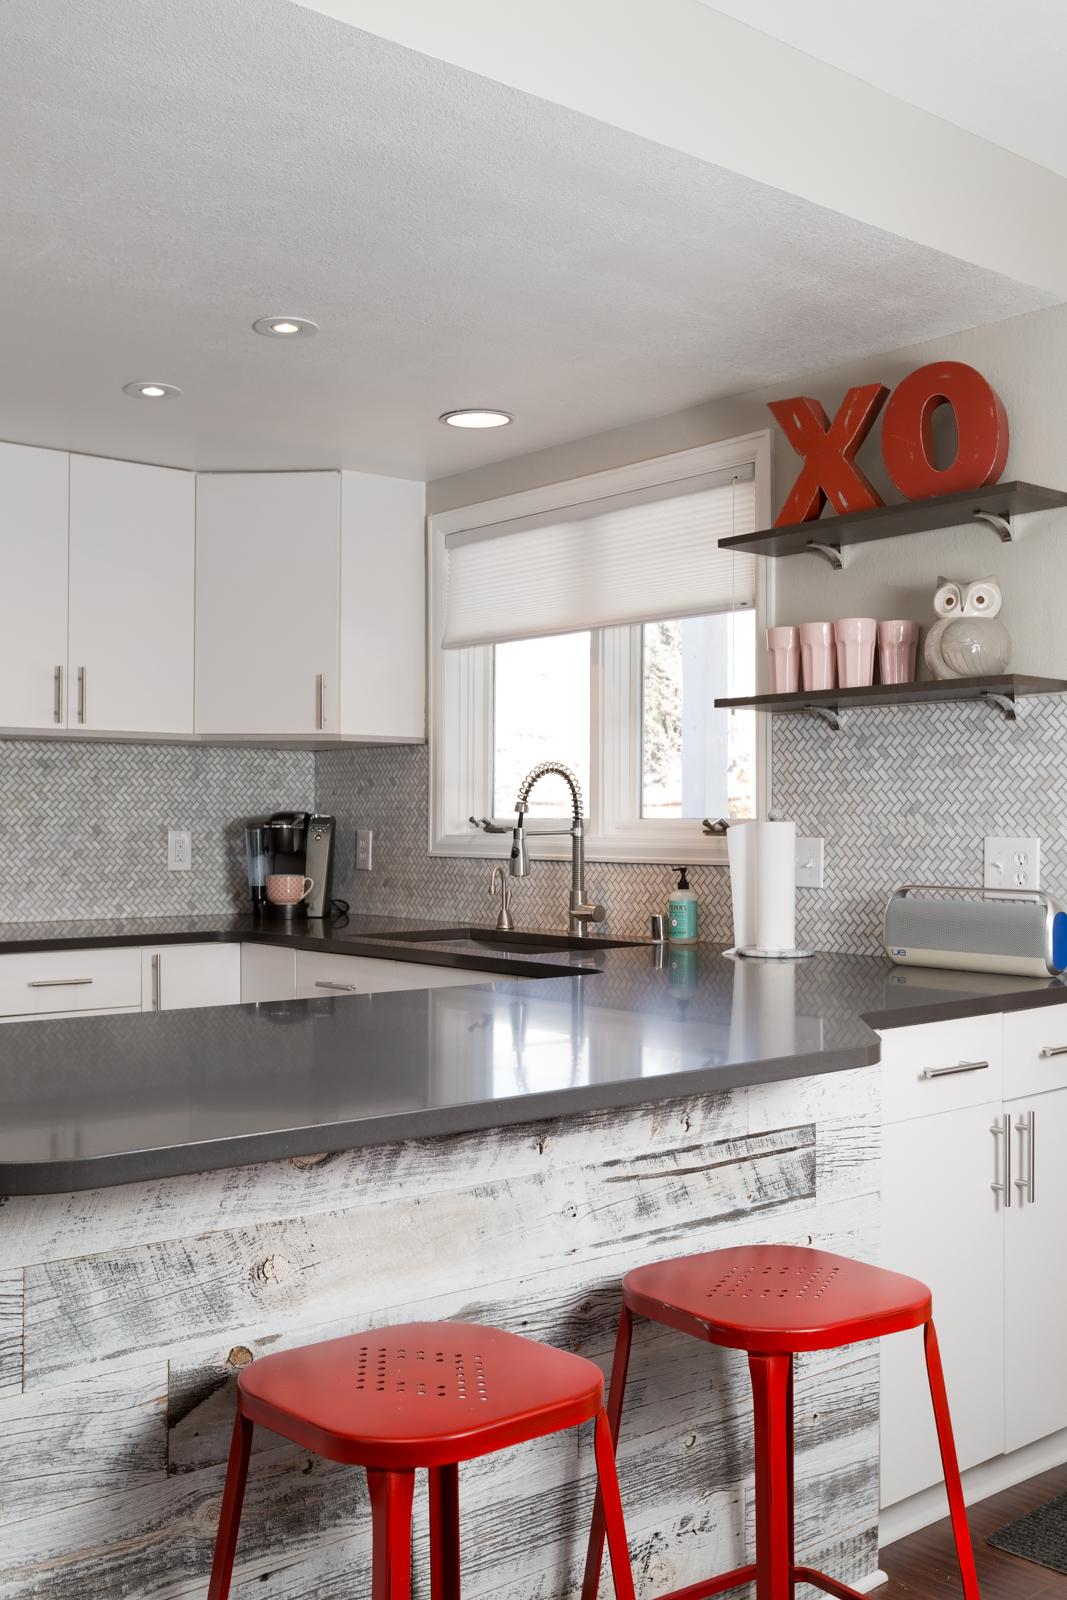 Kitchen-3-3128704595-O.jpg